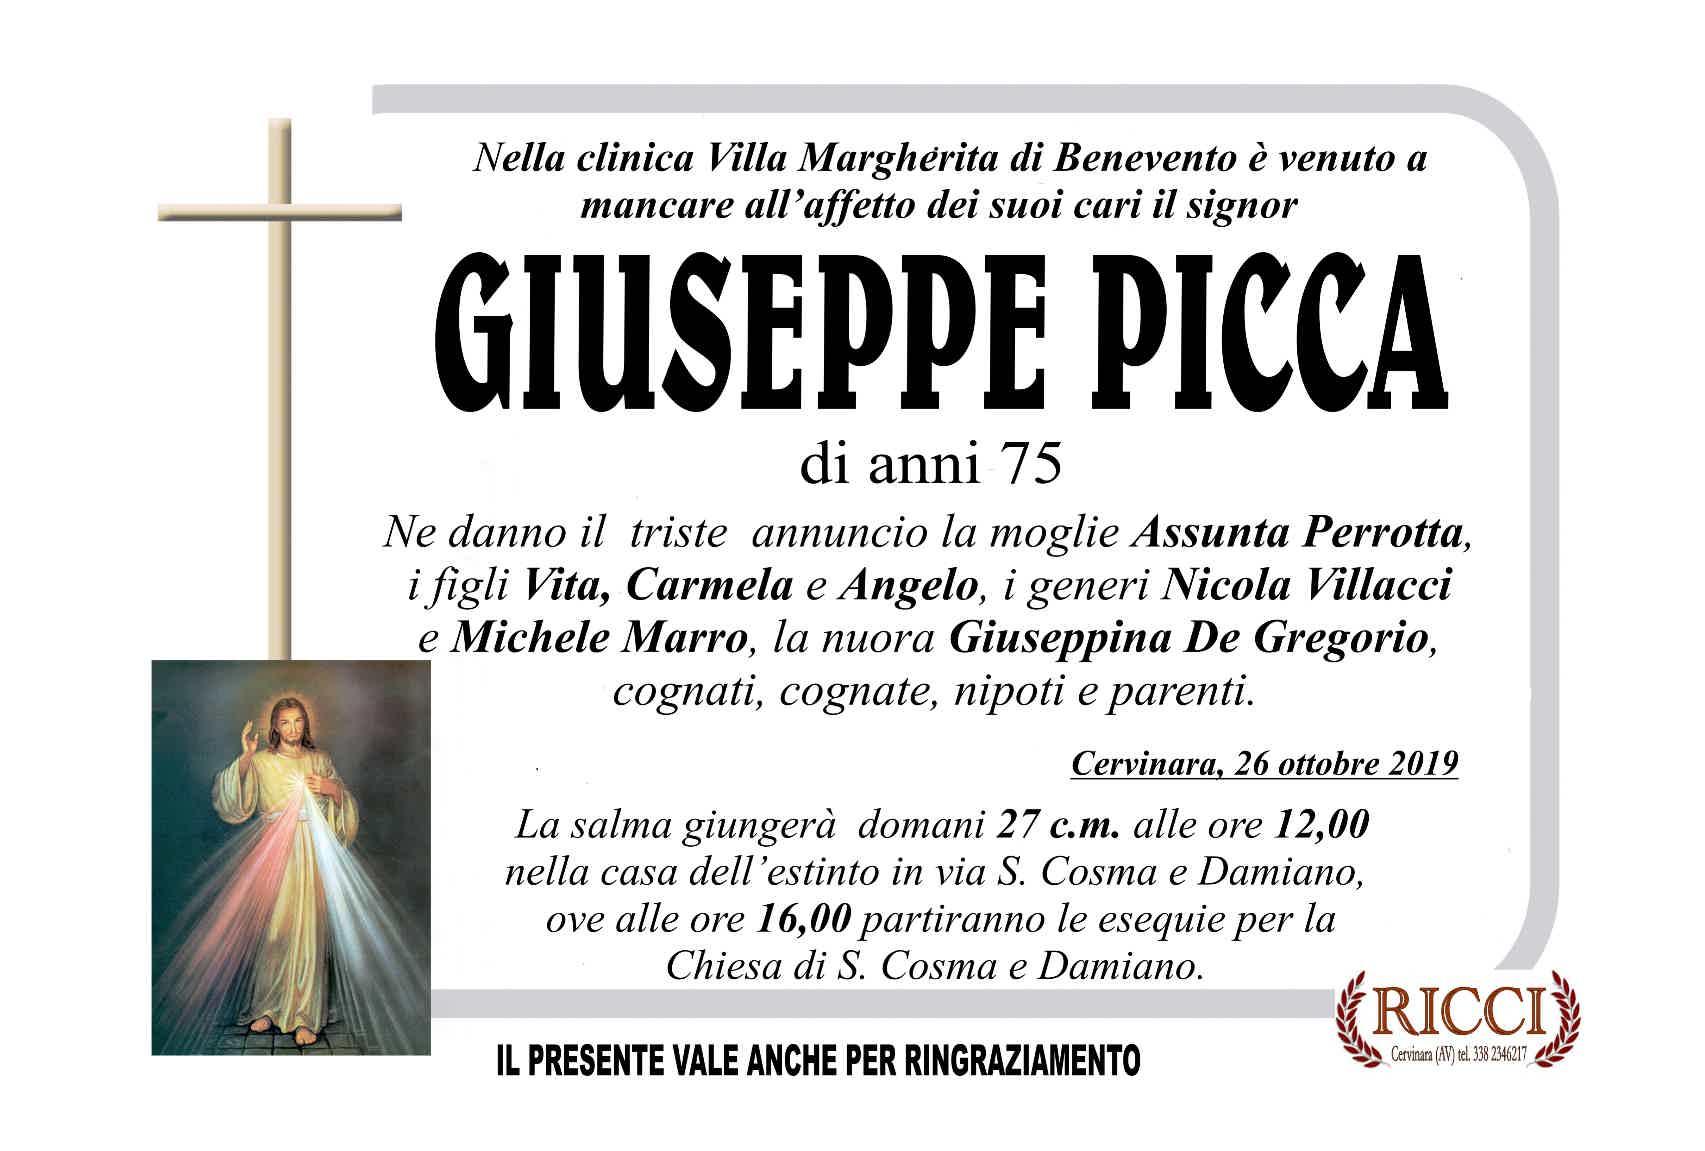 Giuseppe Picca